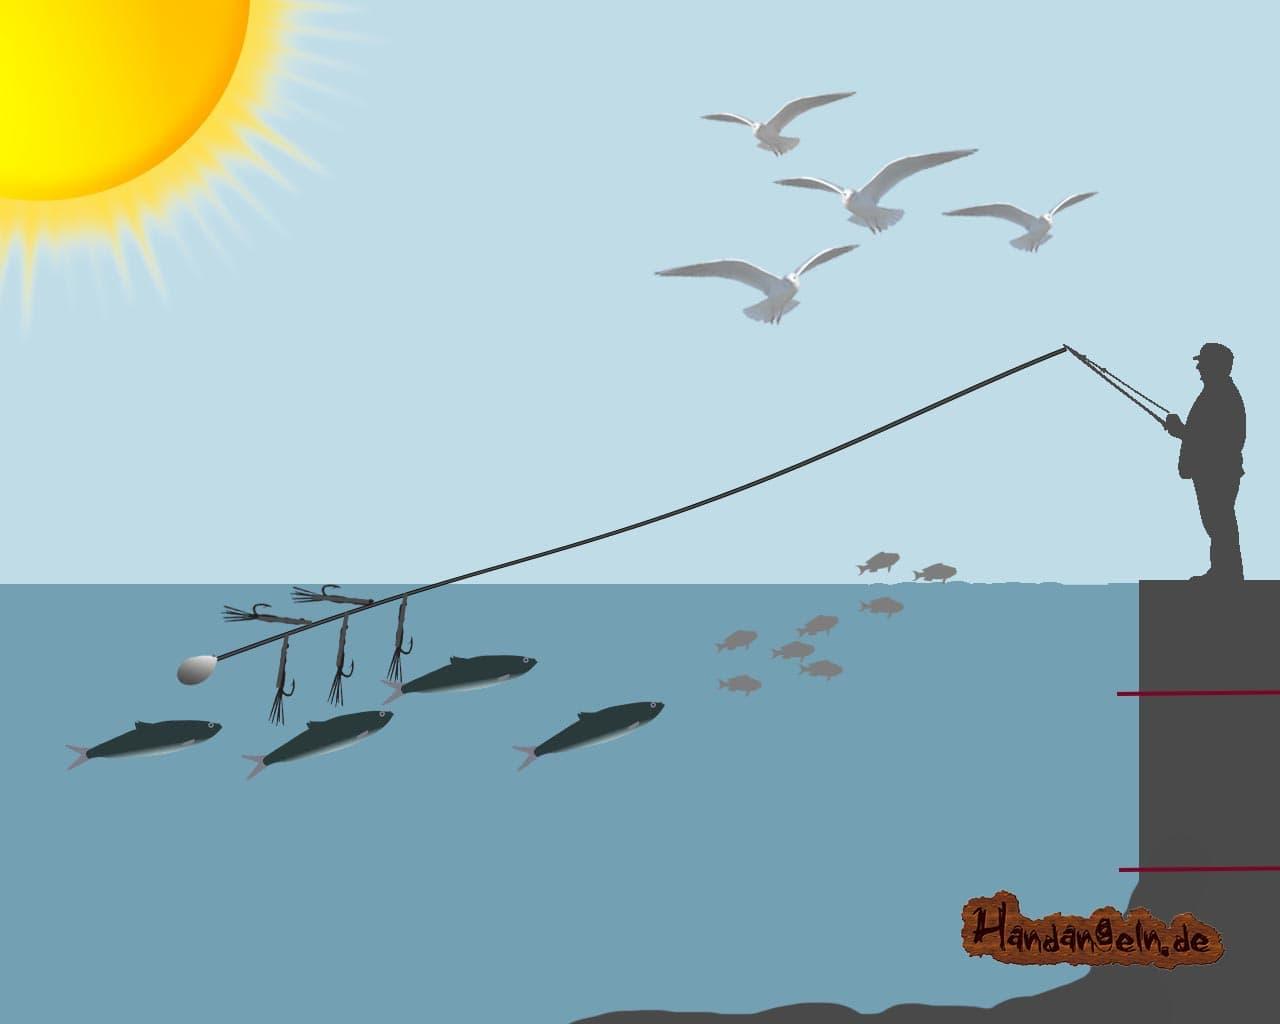 Anwendung Makrelenmontage Ufer Angler Paternoster